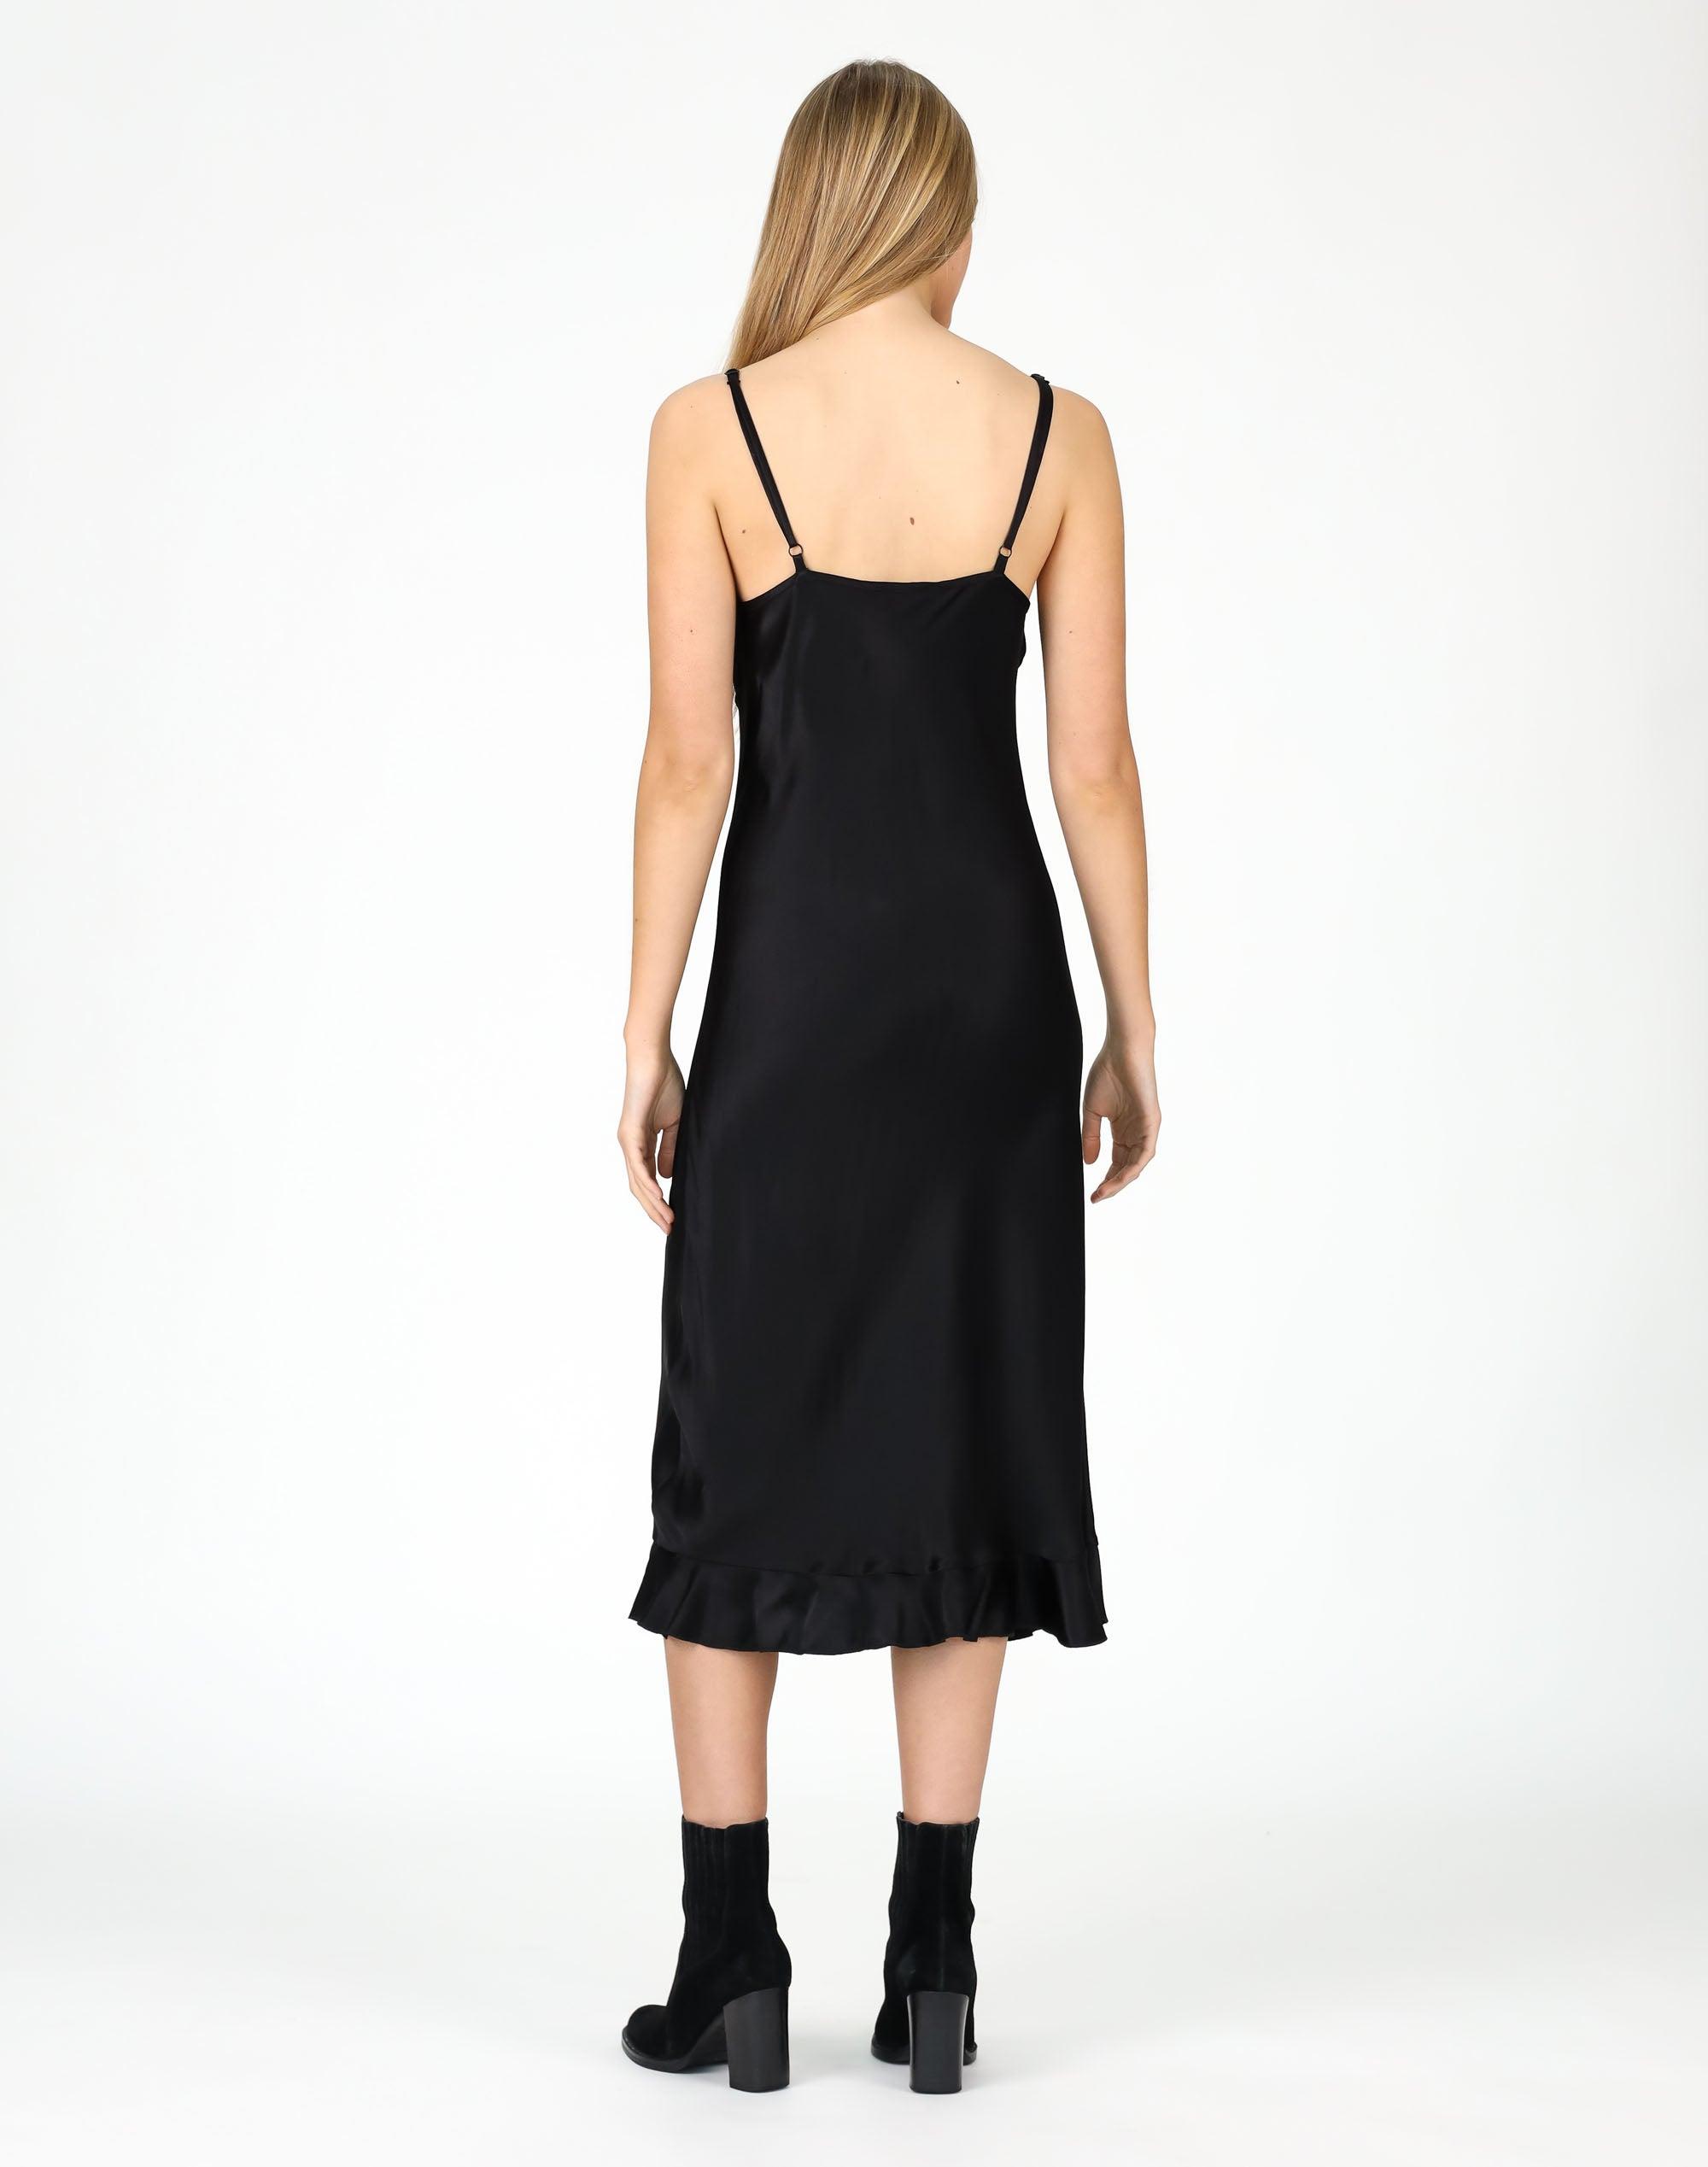 Killick Slip Dress